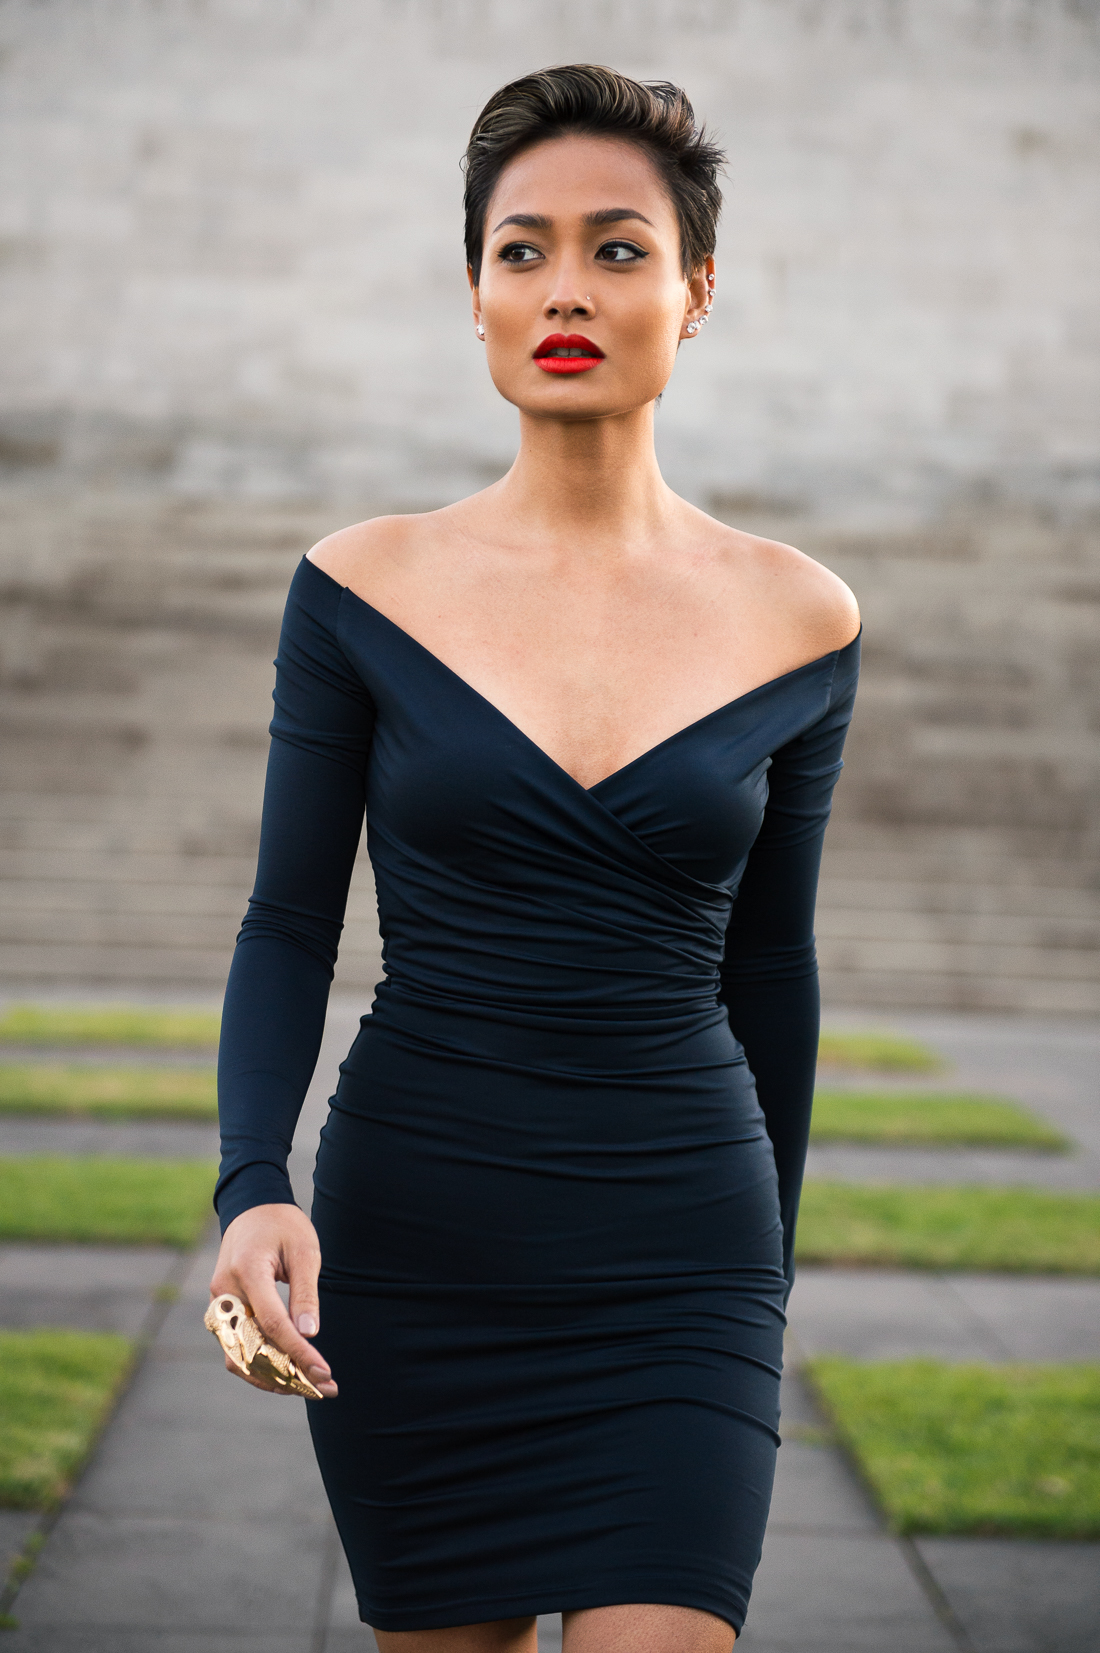 Micah Gianneli_Top fashion style lifestyle beauty blogger_Rihann